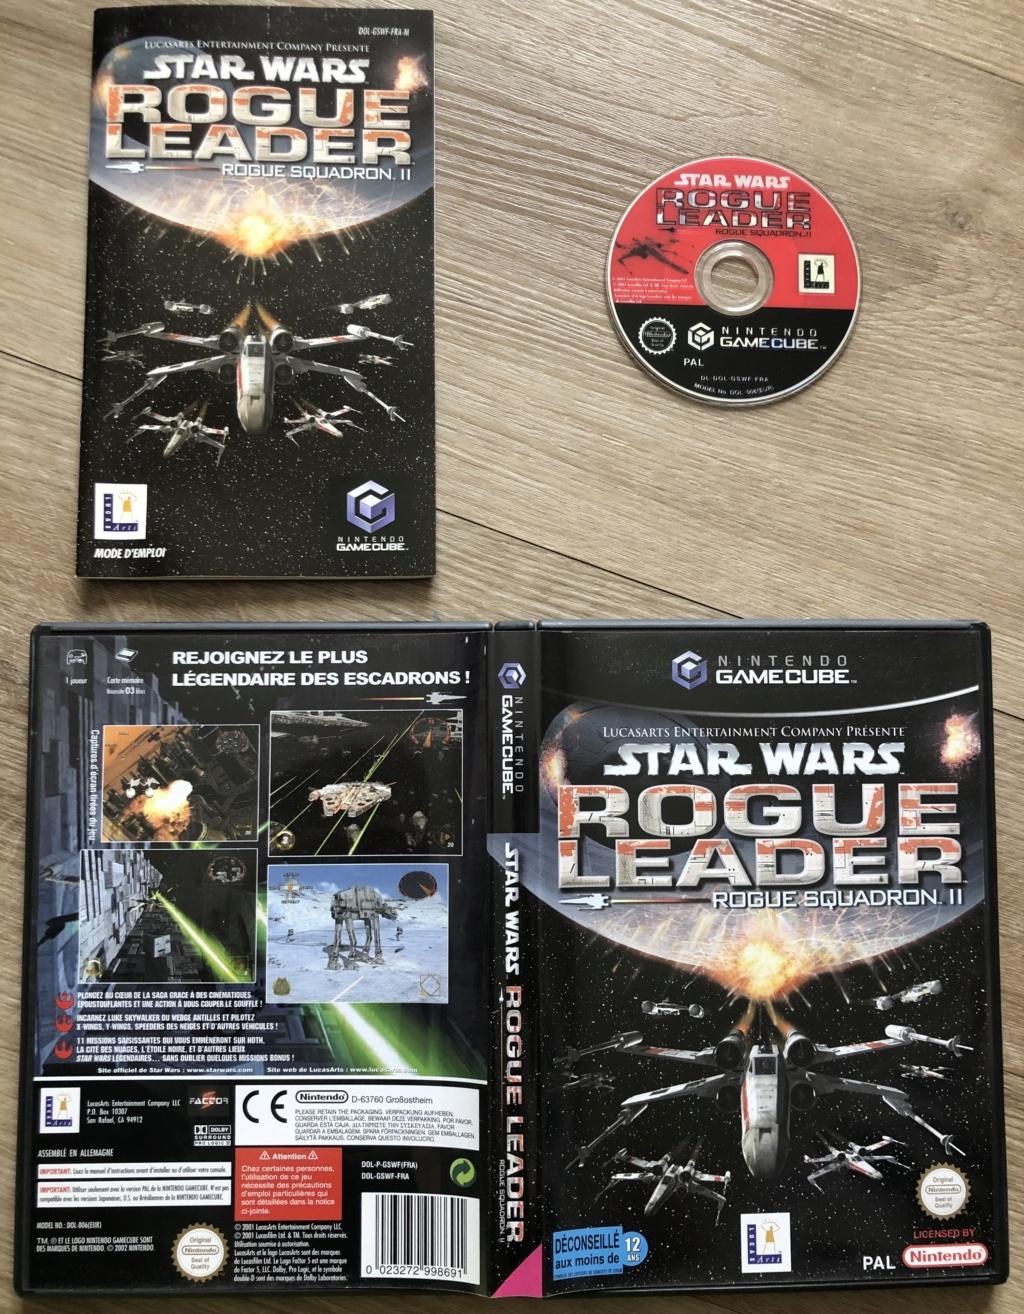 Star Wars Rogue Leader - Rogue Squadron II E01c2610